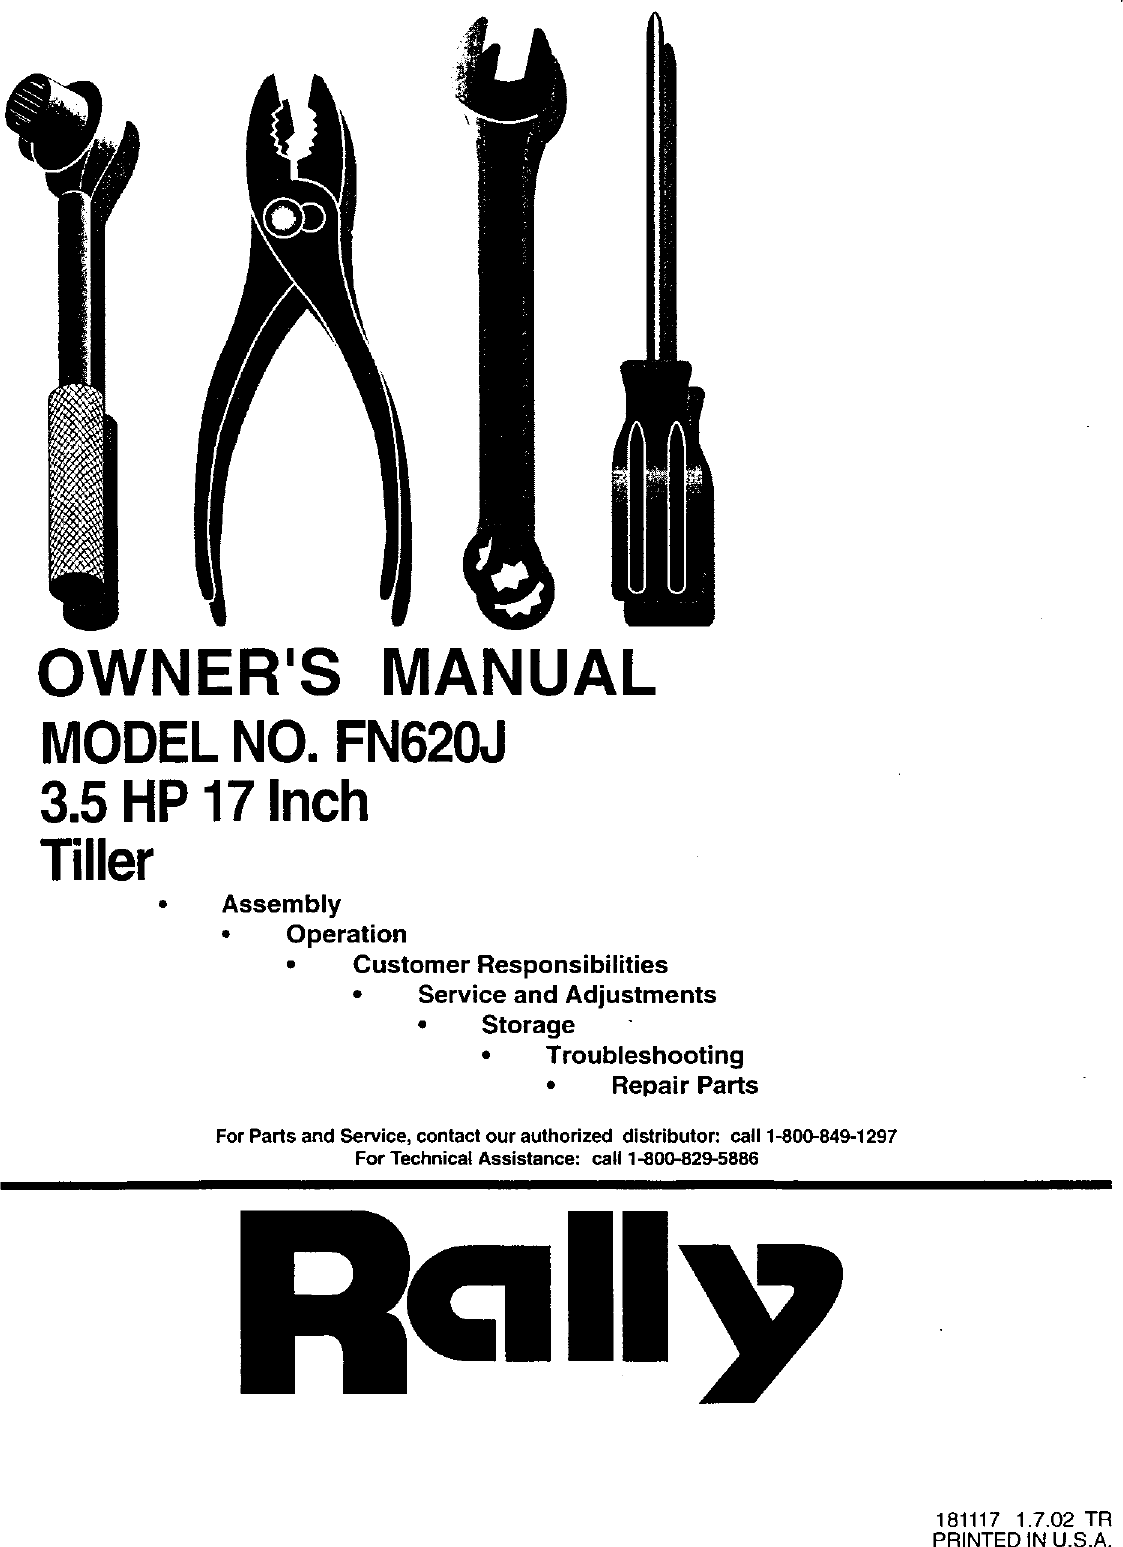 RALLY Front Tine, Gas Tiller Manual L0310225